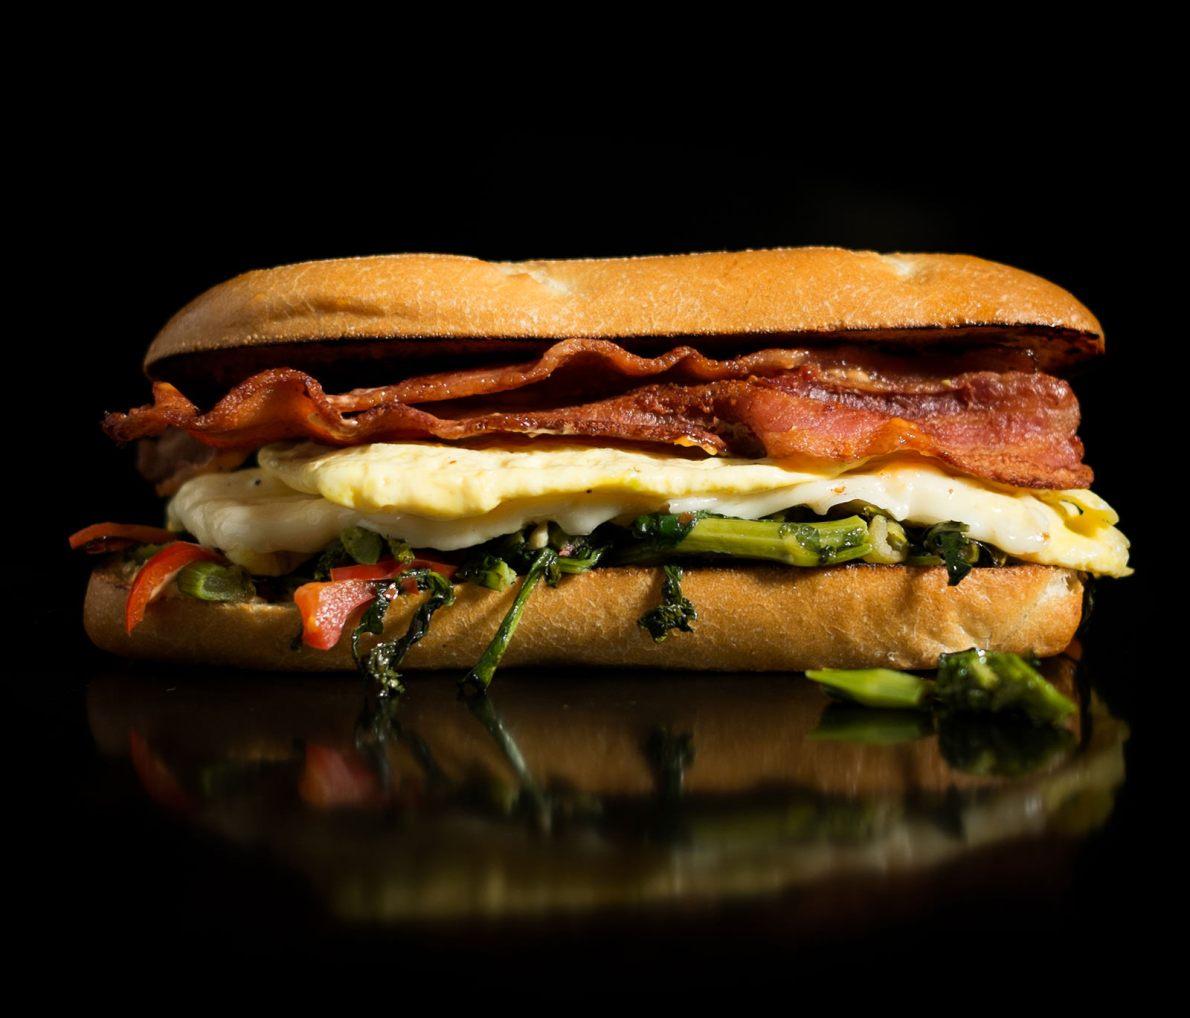 The Almost Veggie Breakfast Sandwich